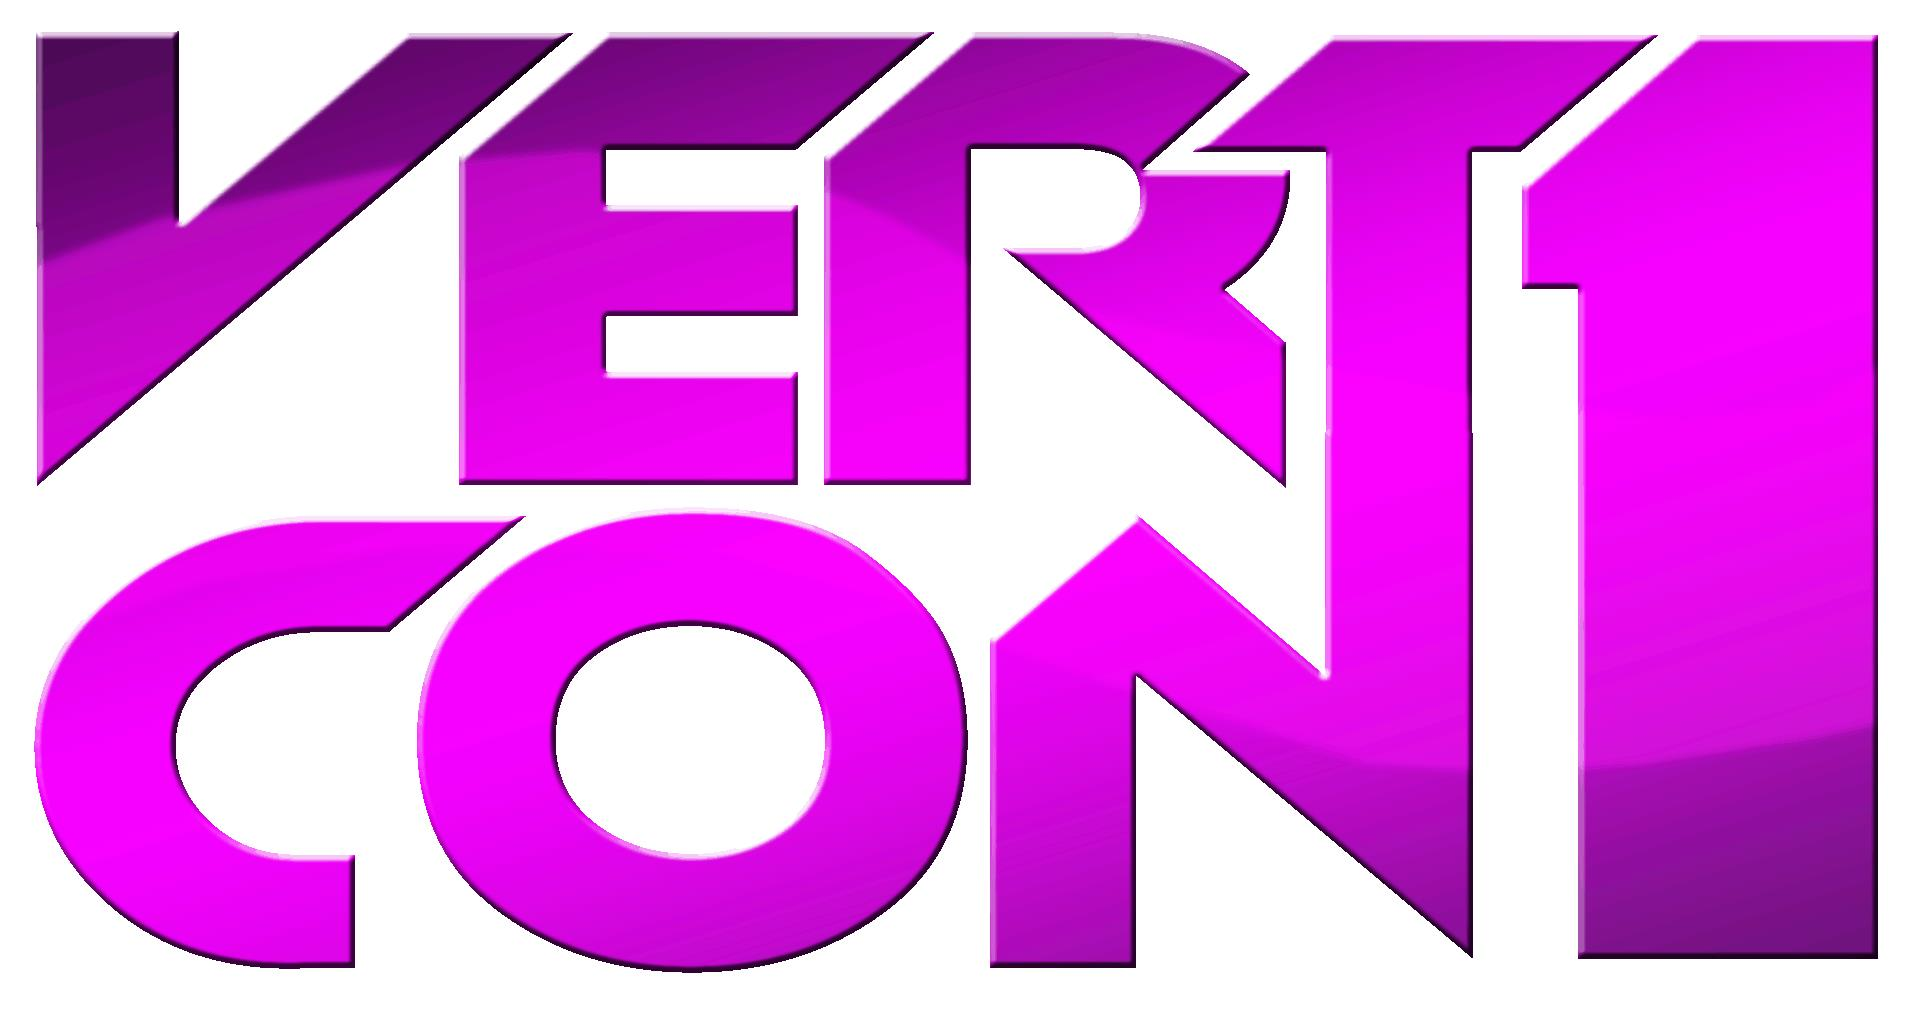 2012-06-24-178529_408008242574680_774034726_o.jpg